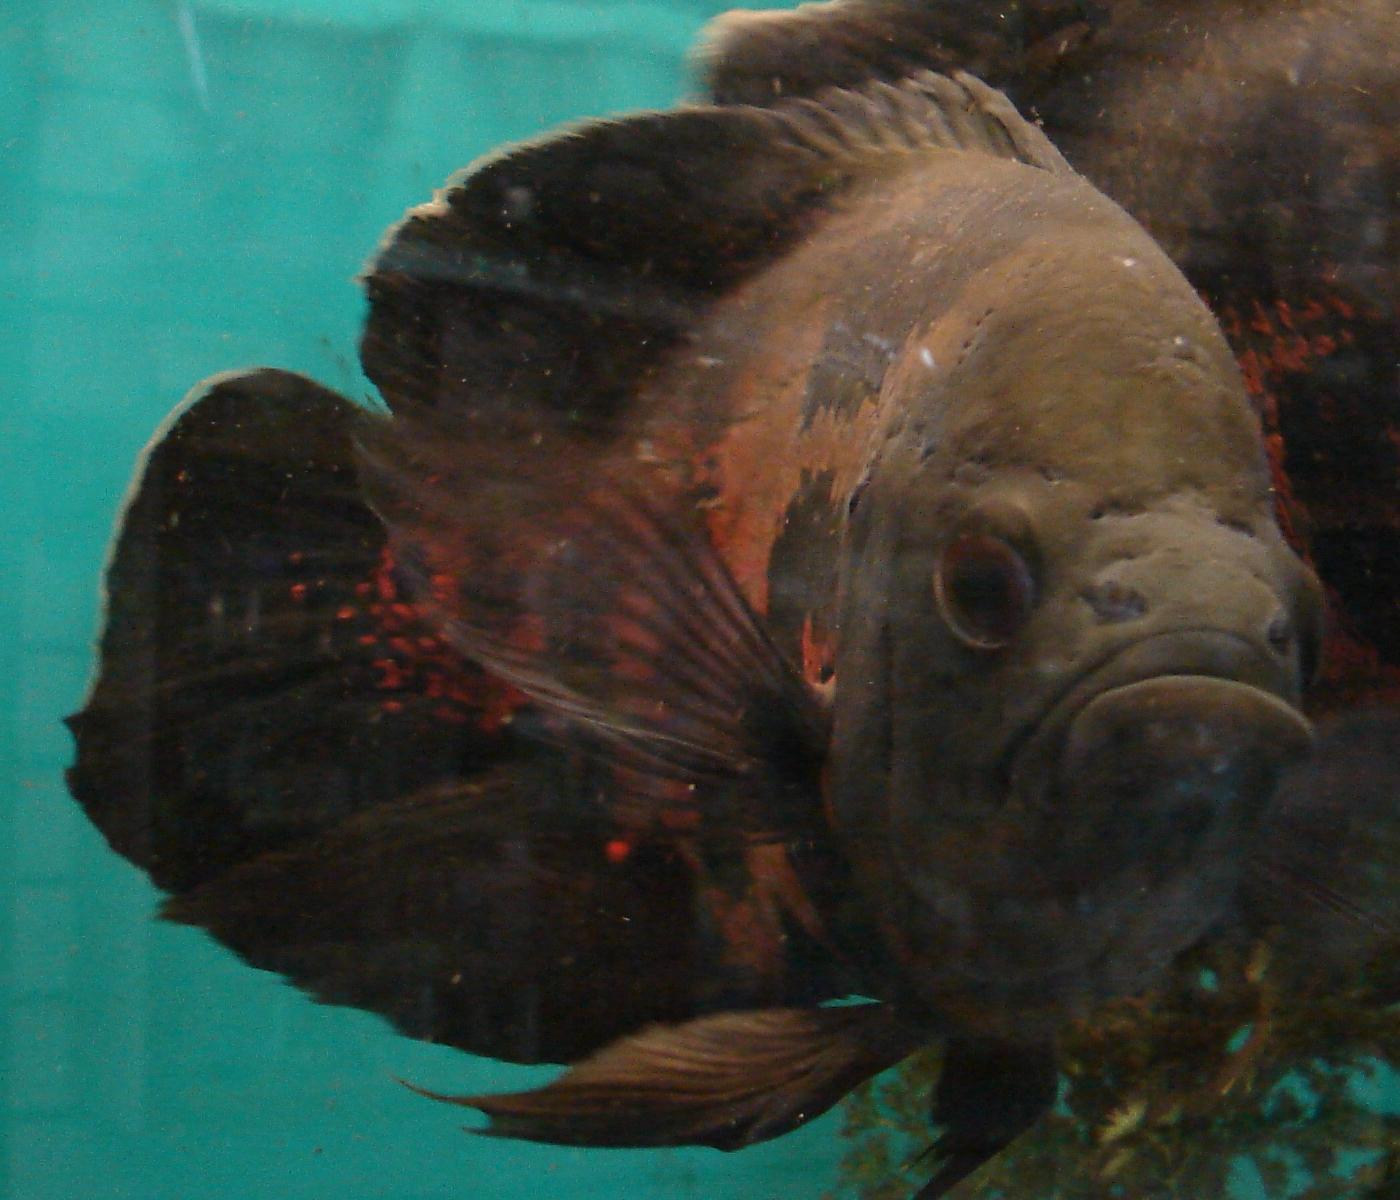 Fish aquarium oscar - Oscar Fish Aquarium 3 By Fantasystock Oscar Fish Aquarium 3 By Fantasystock